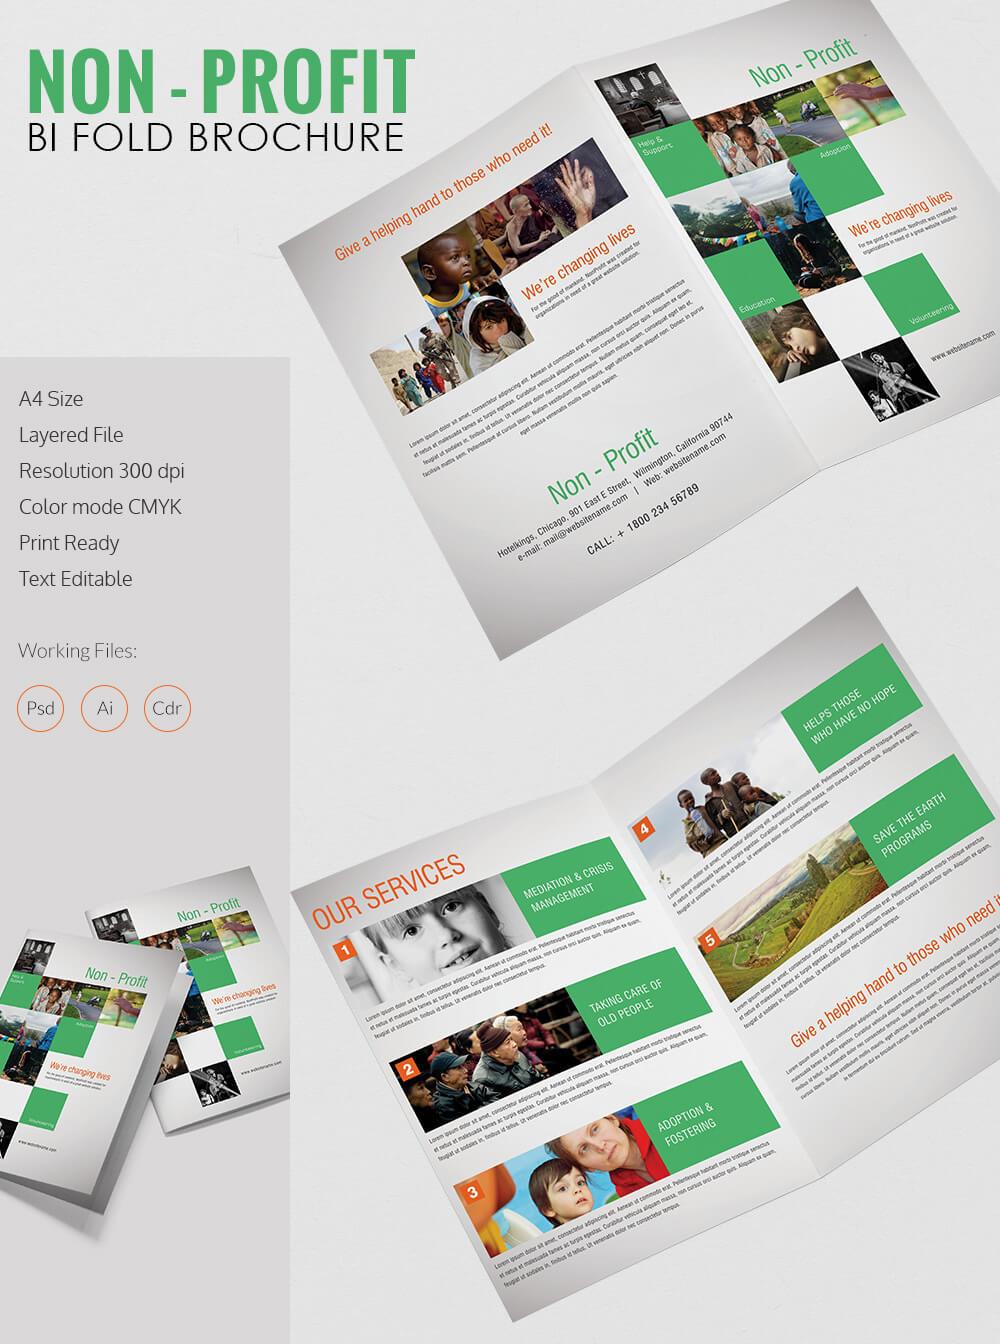 Bi Fold Brochure Template A4 Psd Free Download Illustrator For Illustrator Brochure Templates Free Download